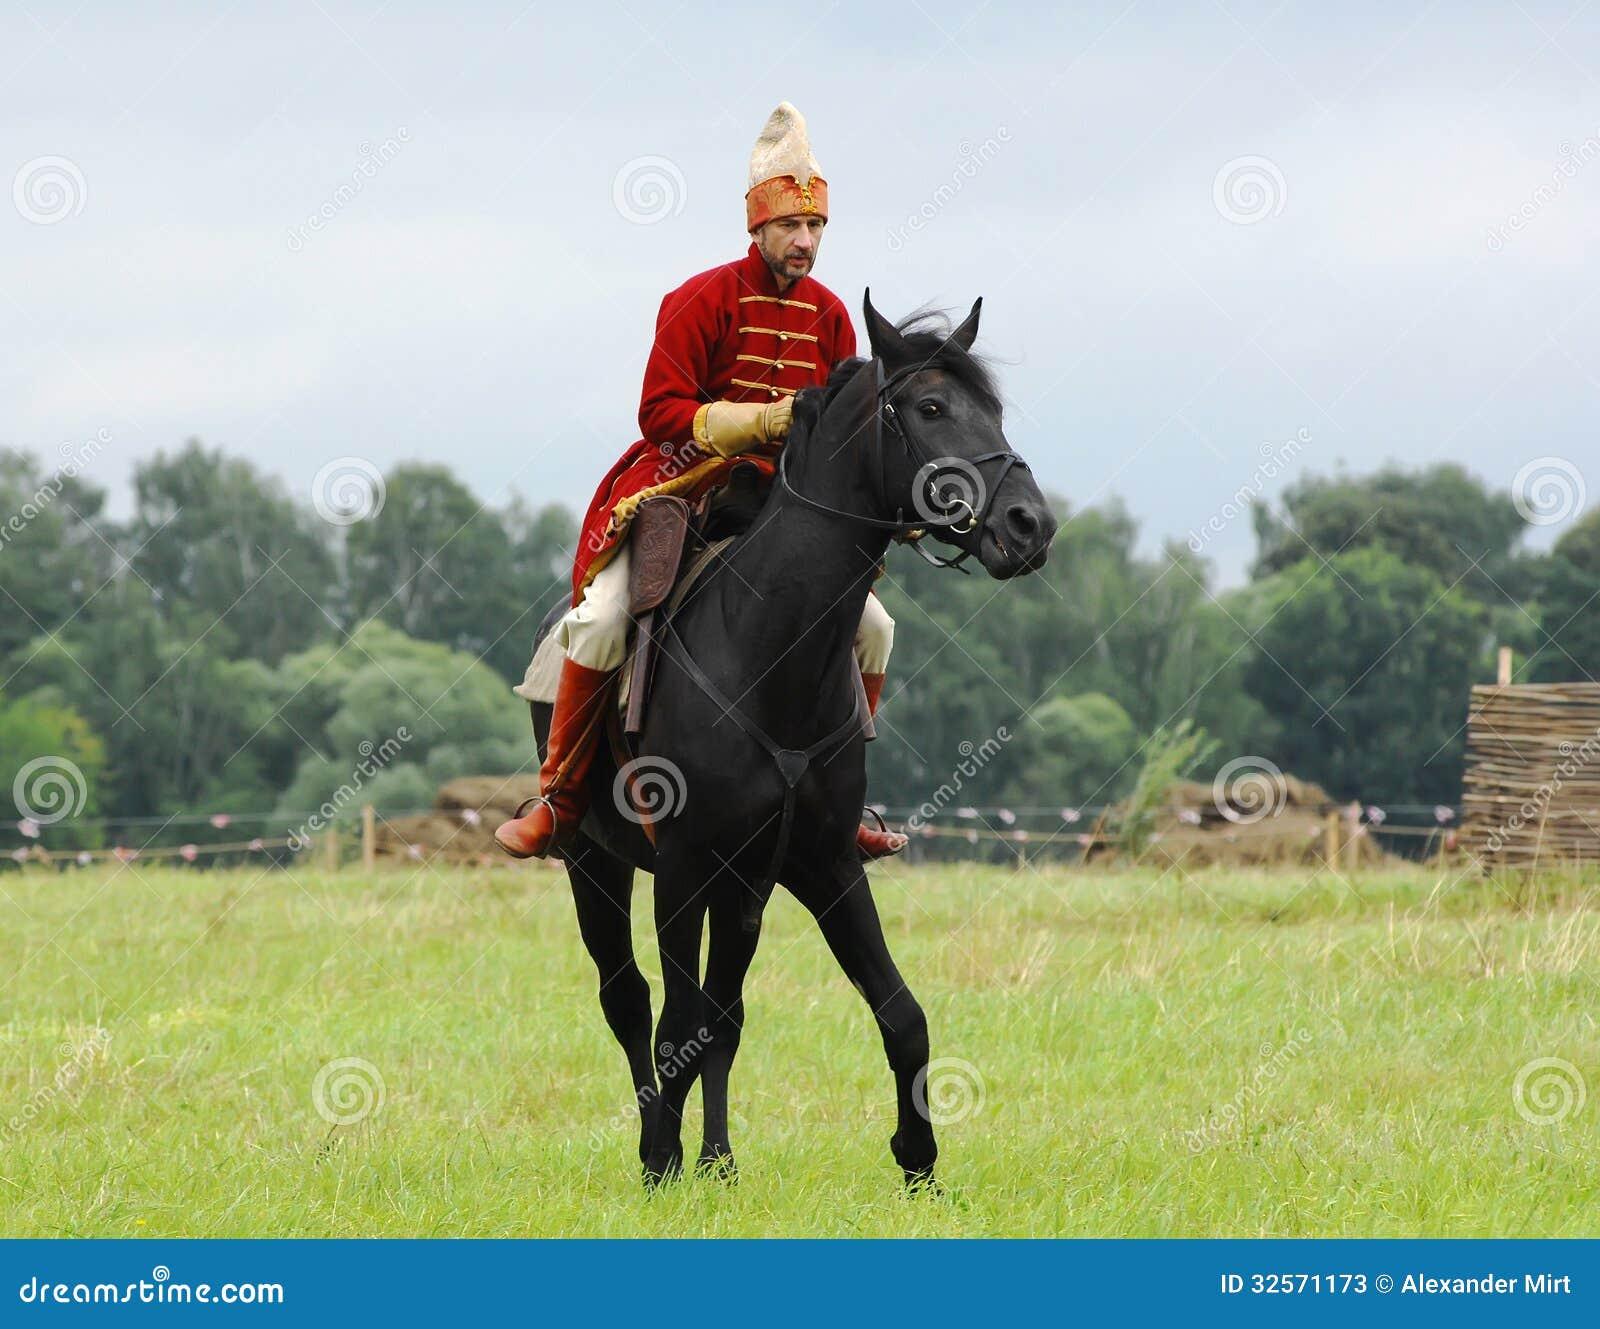 On horse photo 67